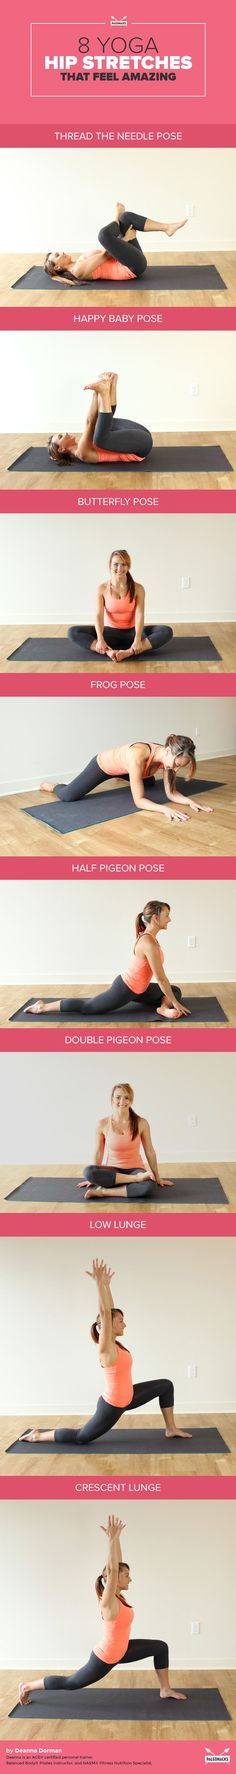 8 Yoga Hip Stretches That Feel Amazing.